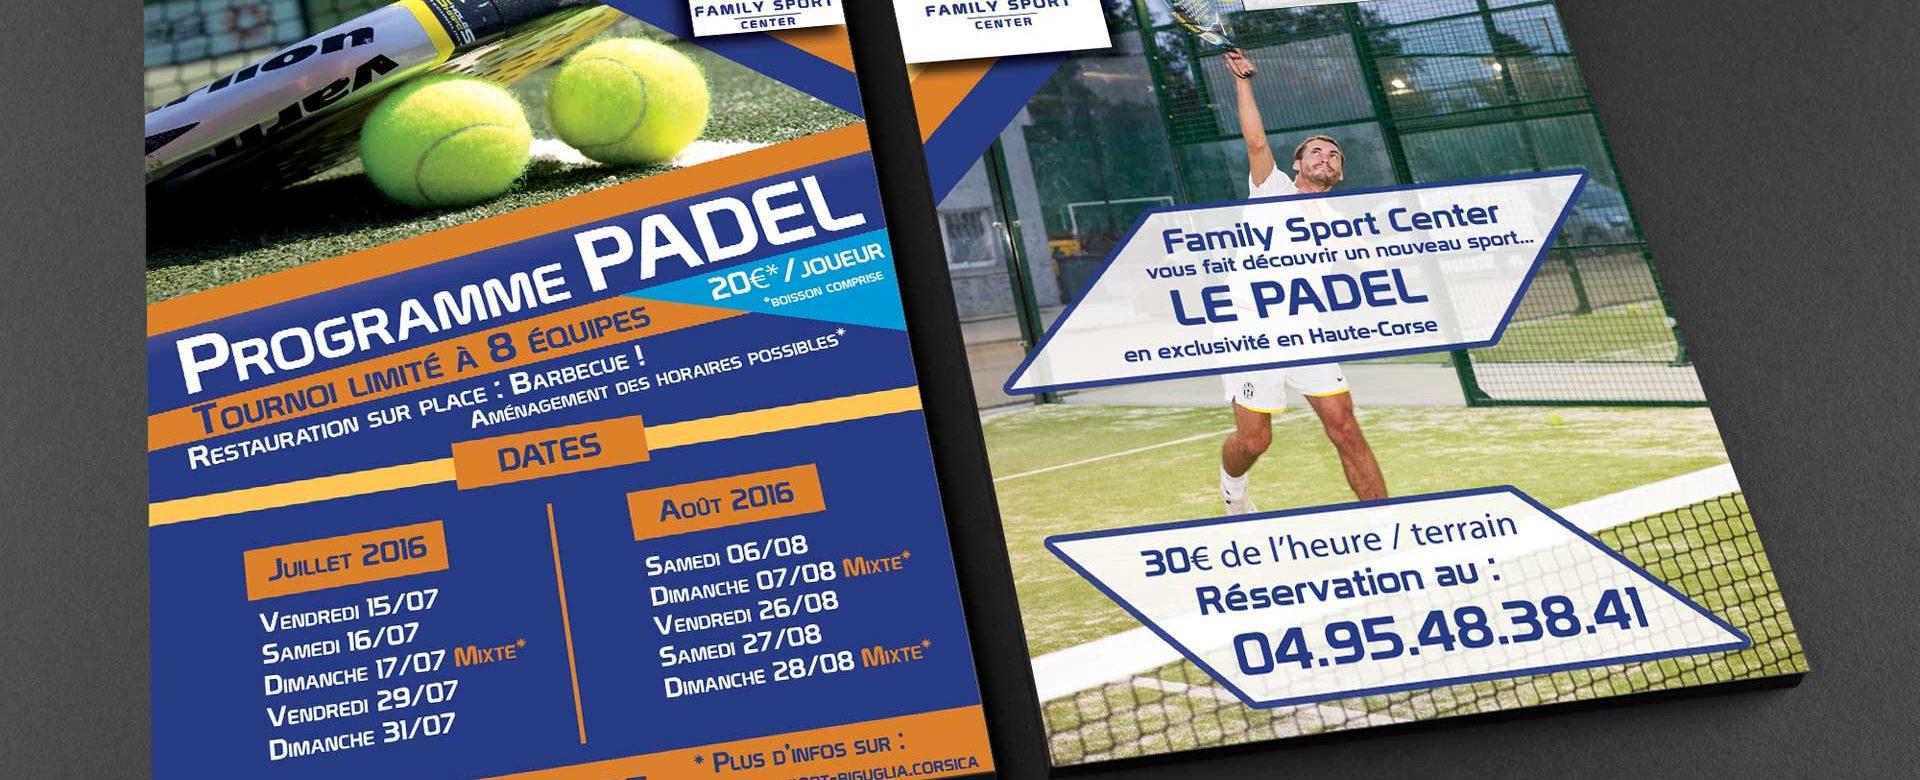 family-sport-center-flyers-corse